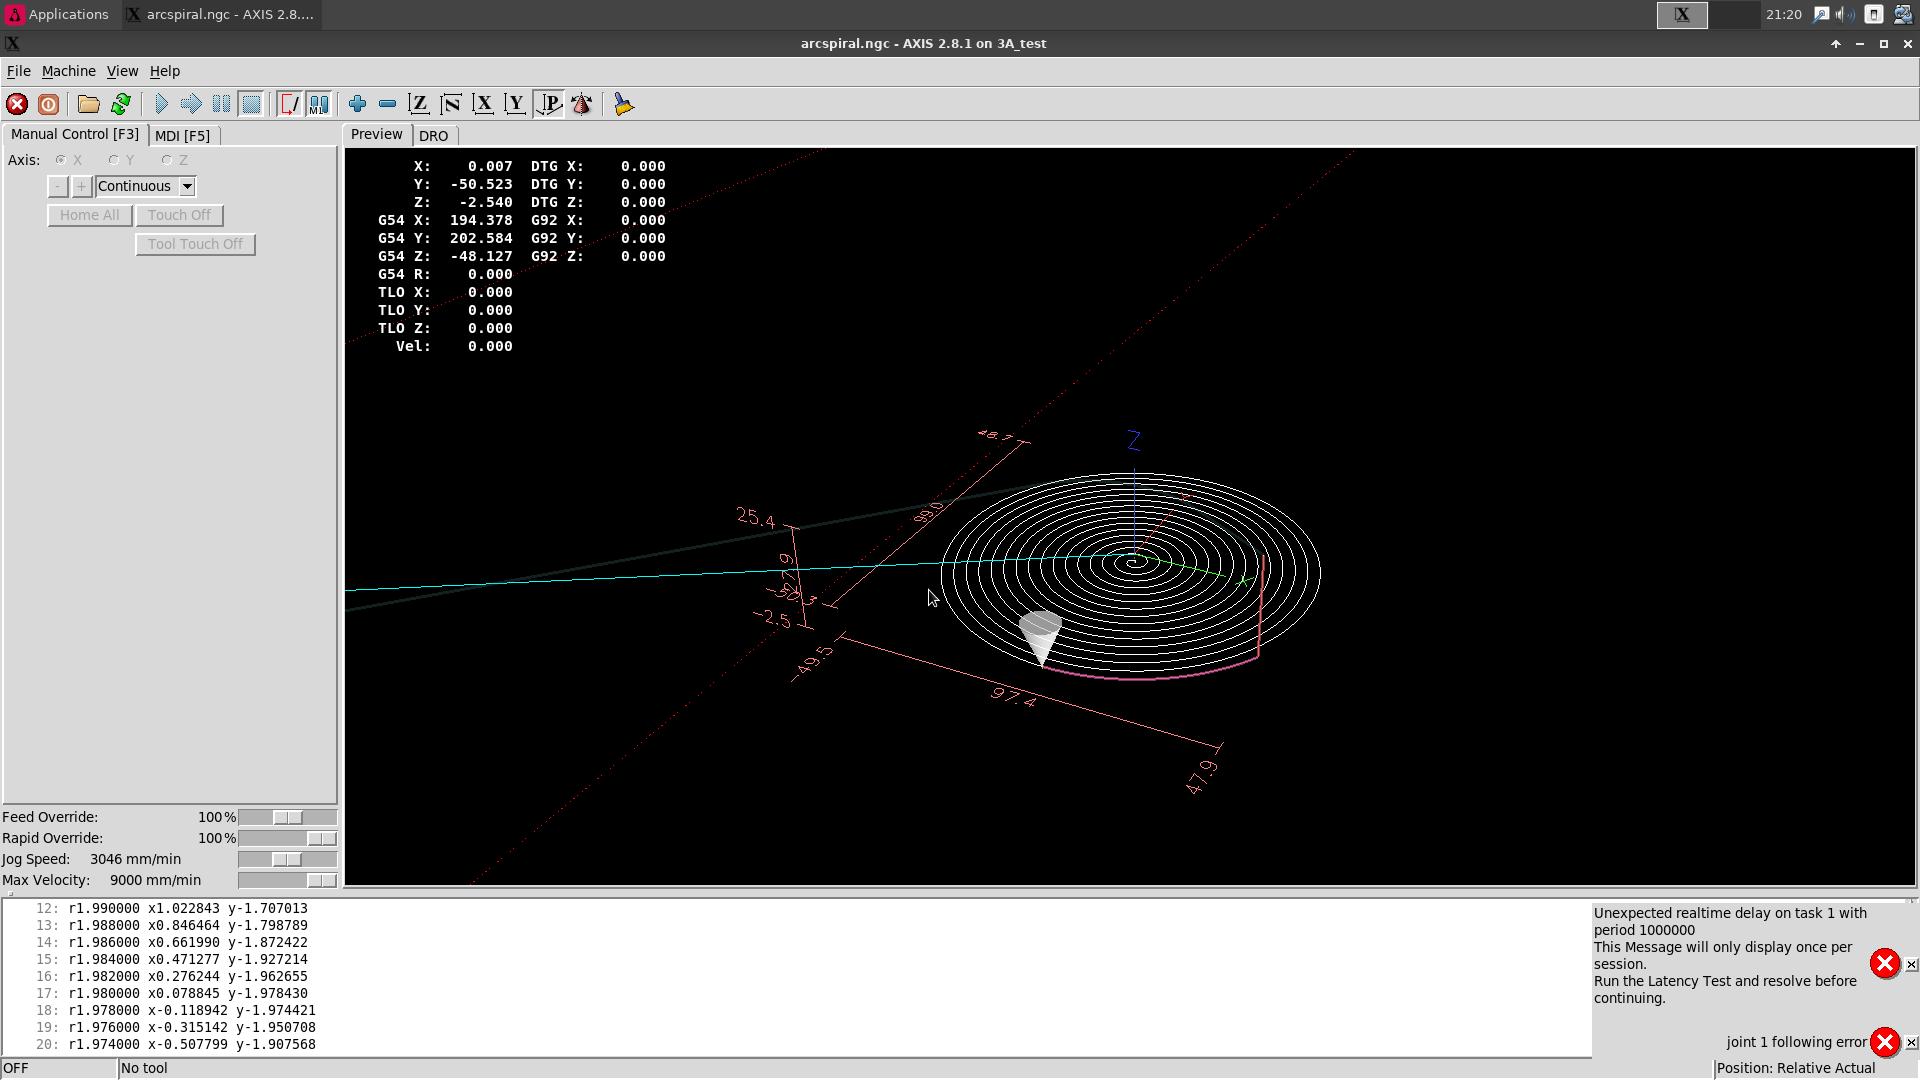 Screenshot_2021-07-28_21-20-08.png